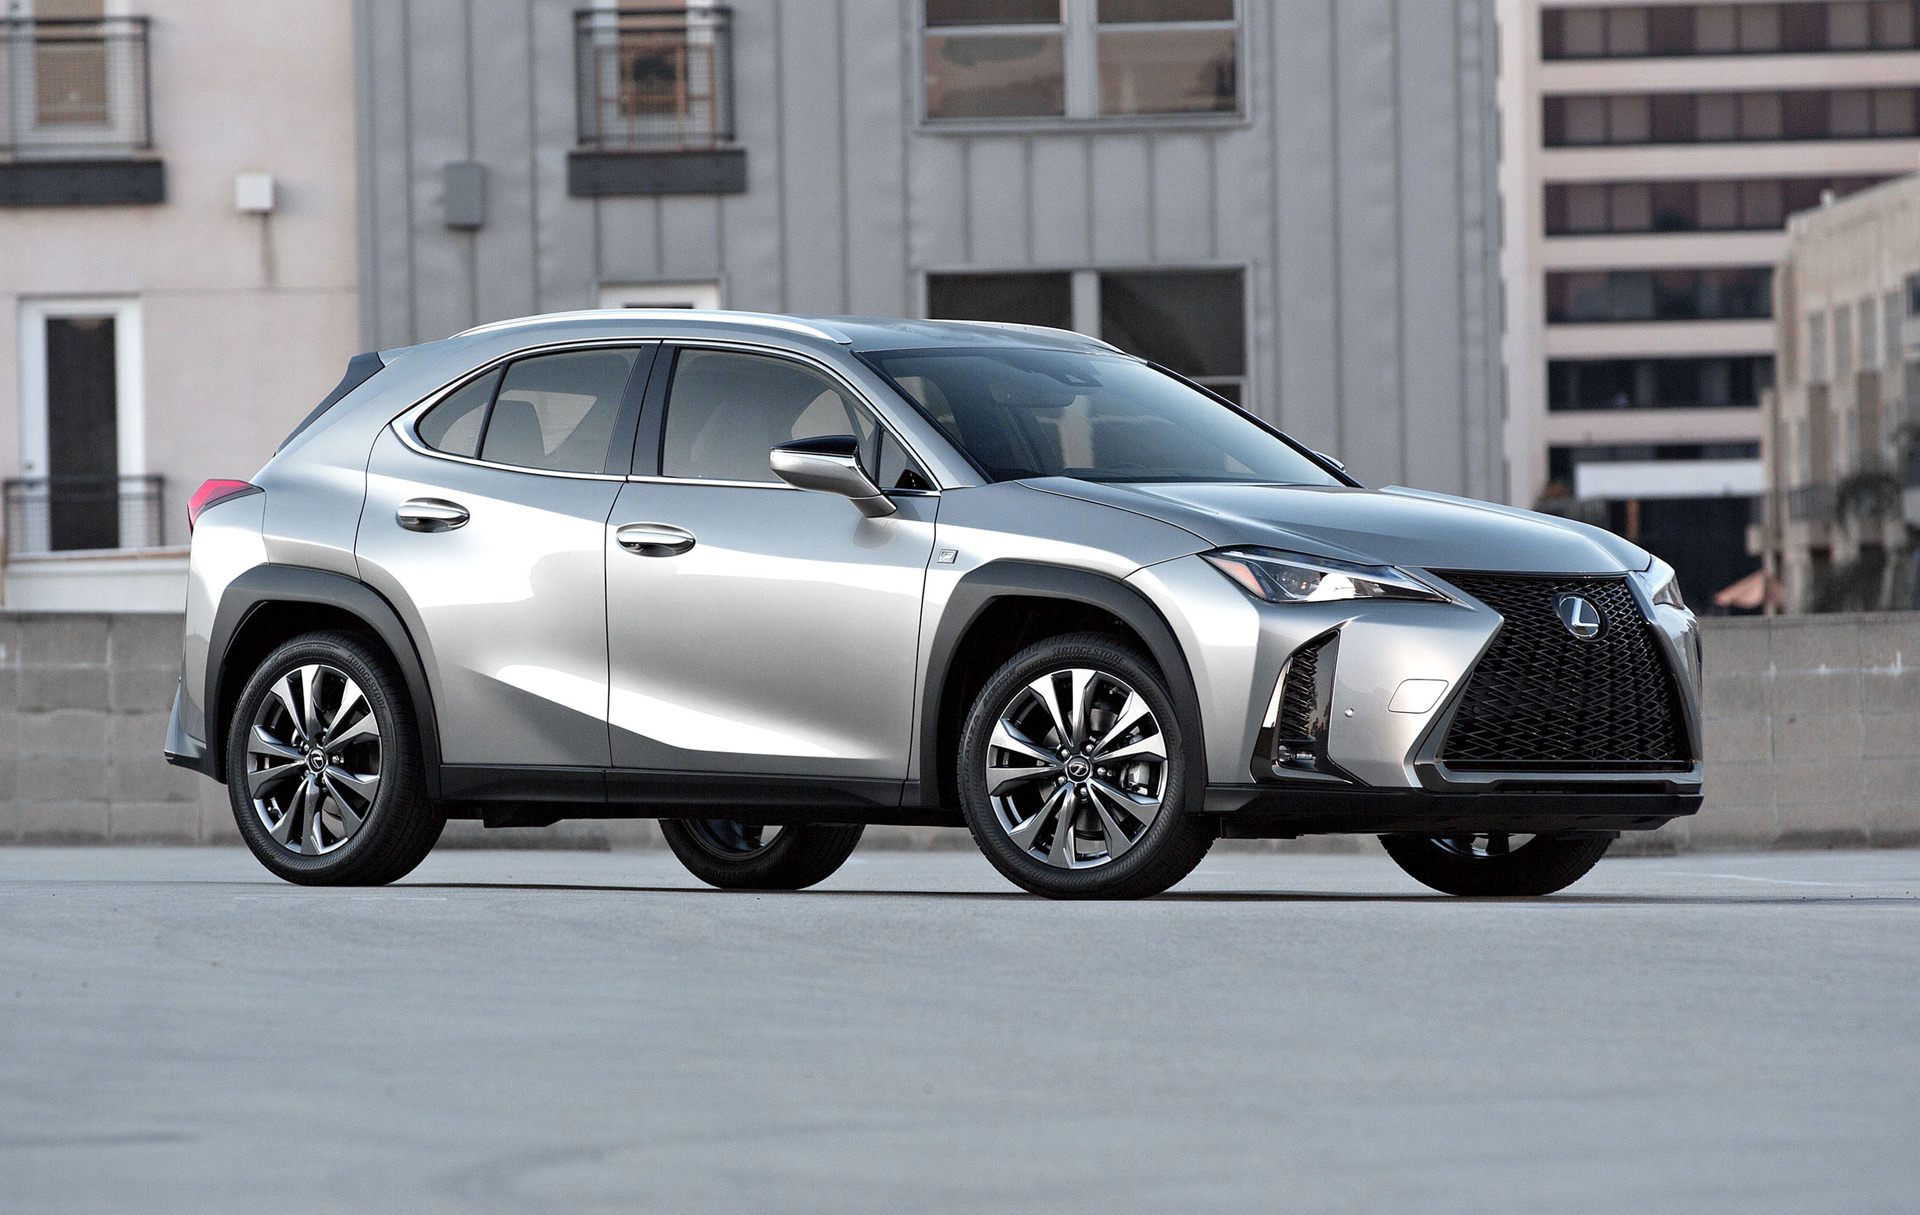 73 Best Review Lexus Electric Car 2020 Style for Lexus Electric Car 2020